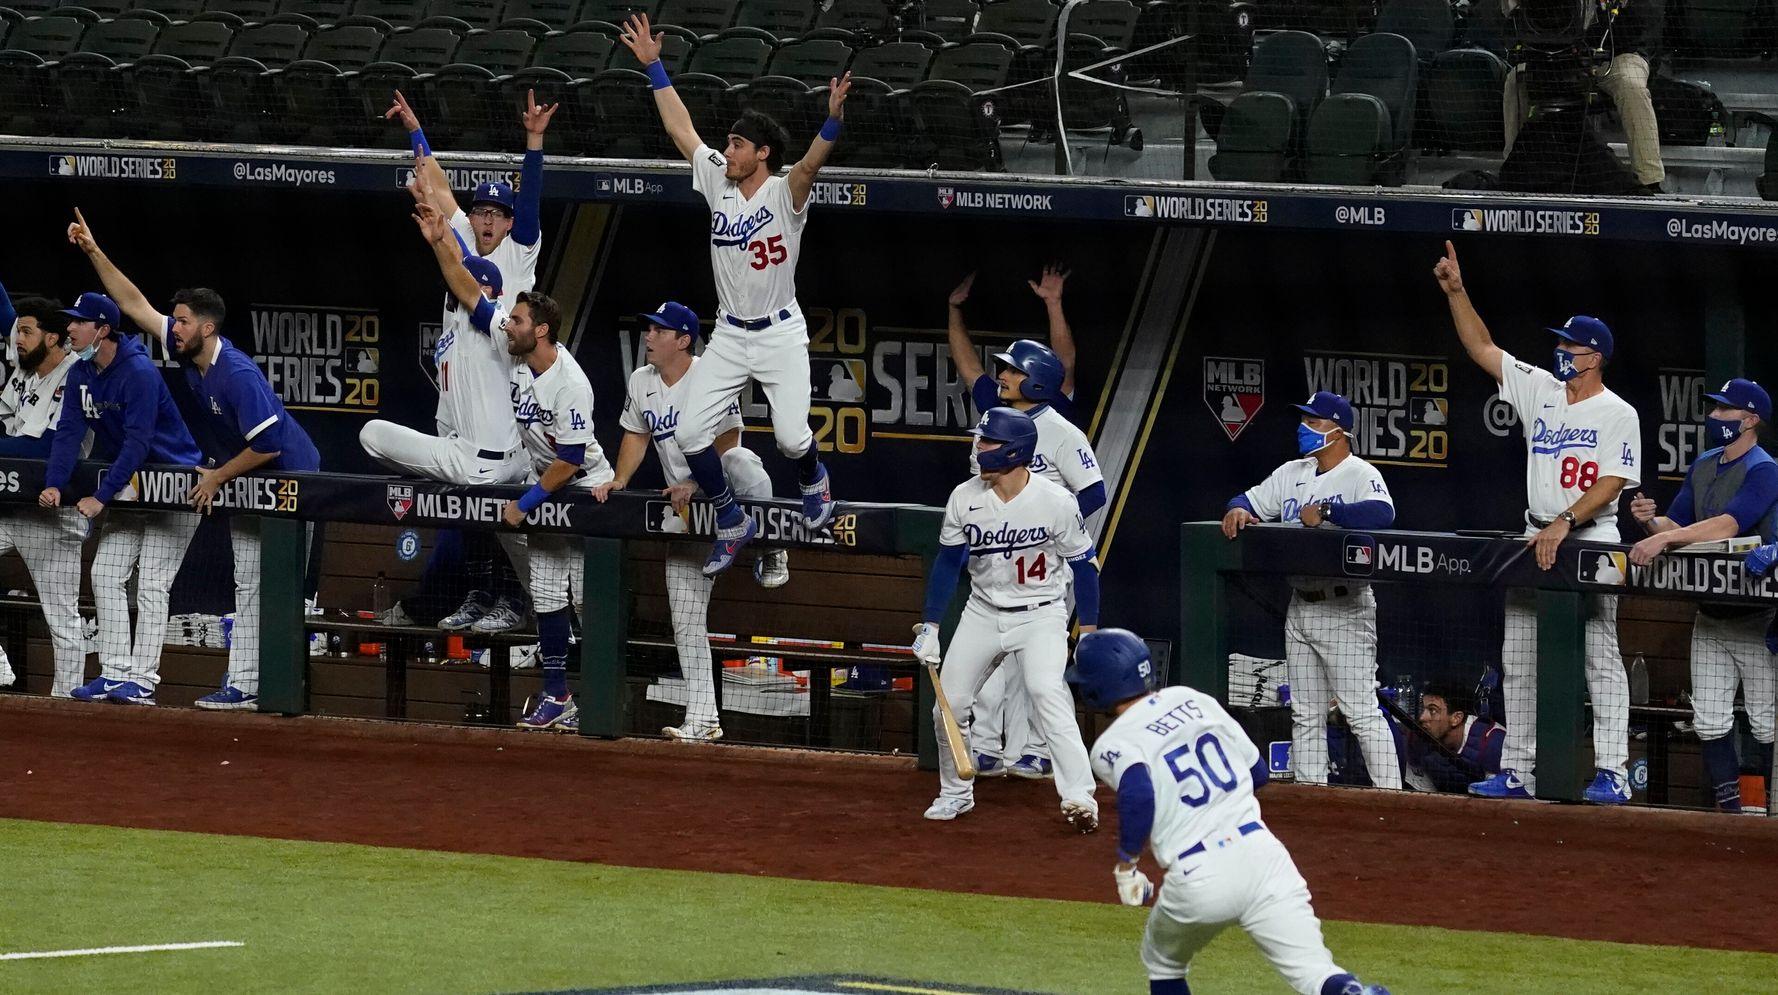 Los Angeles Dodgers Win 2020 World Series